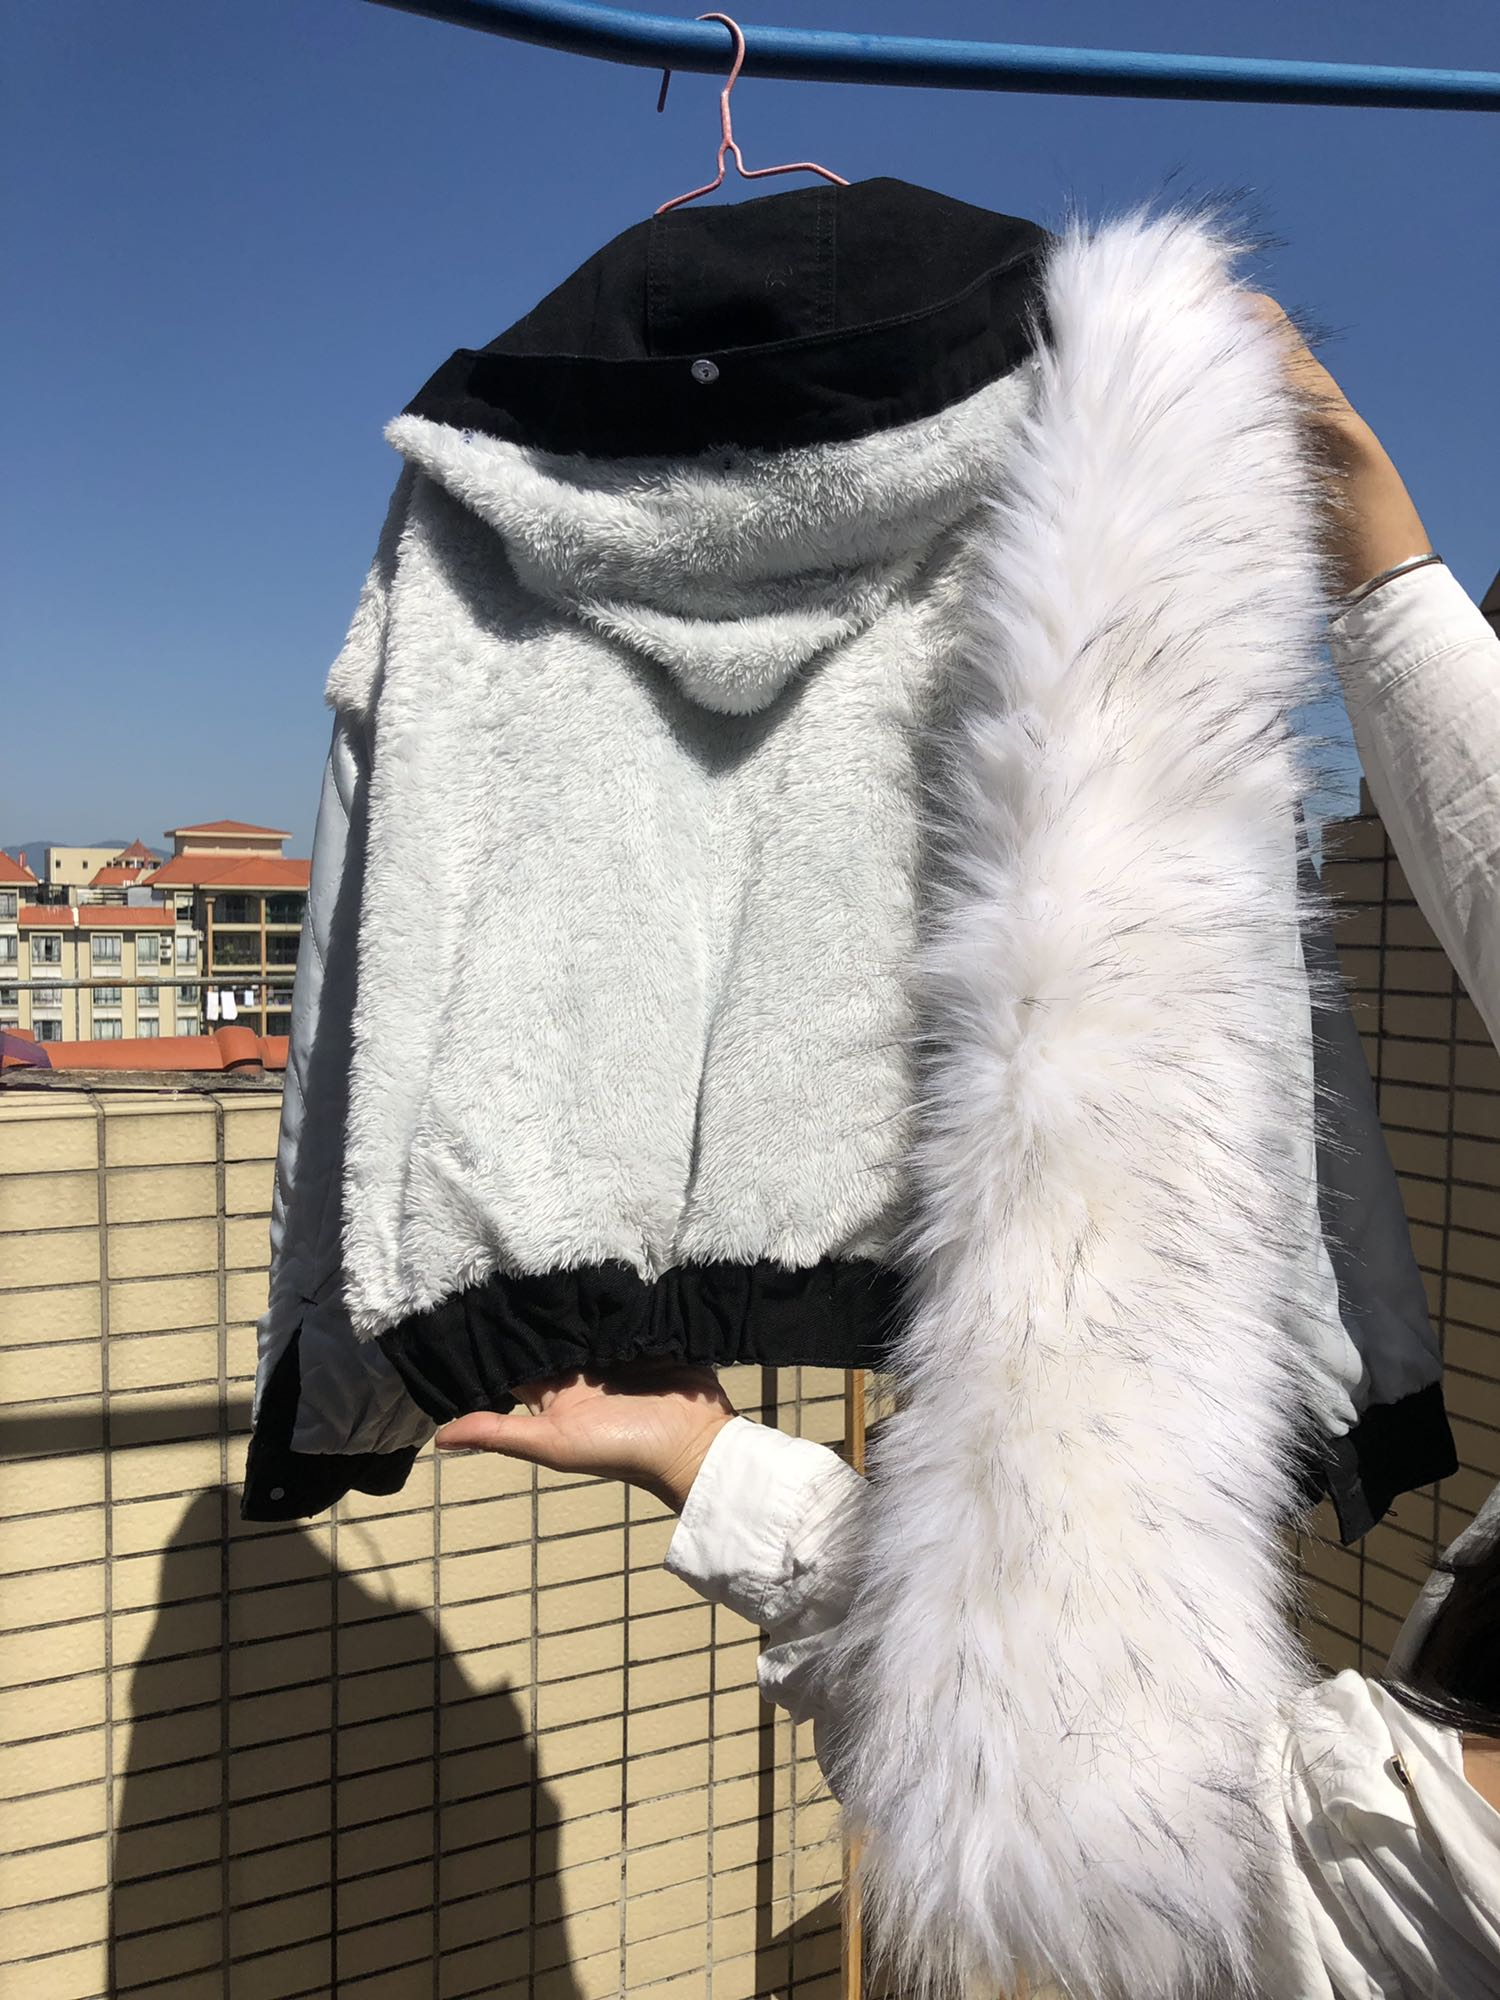 H2afd9952f94244f1aed6bd2fe24c20602 LUZUZI 2019 New Warm Winter Bomber Women Winter Autumn Hooded Girls Coat Jeans Denim Jackets Basic Ladies Top Windbreaker Female